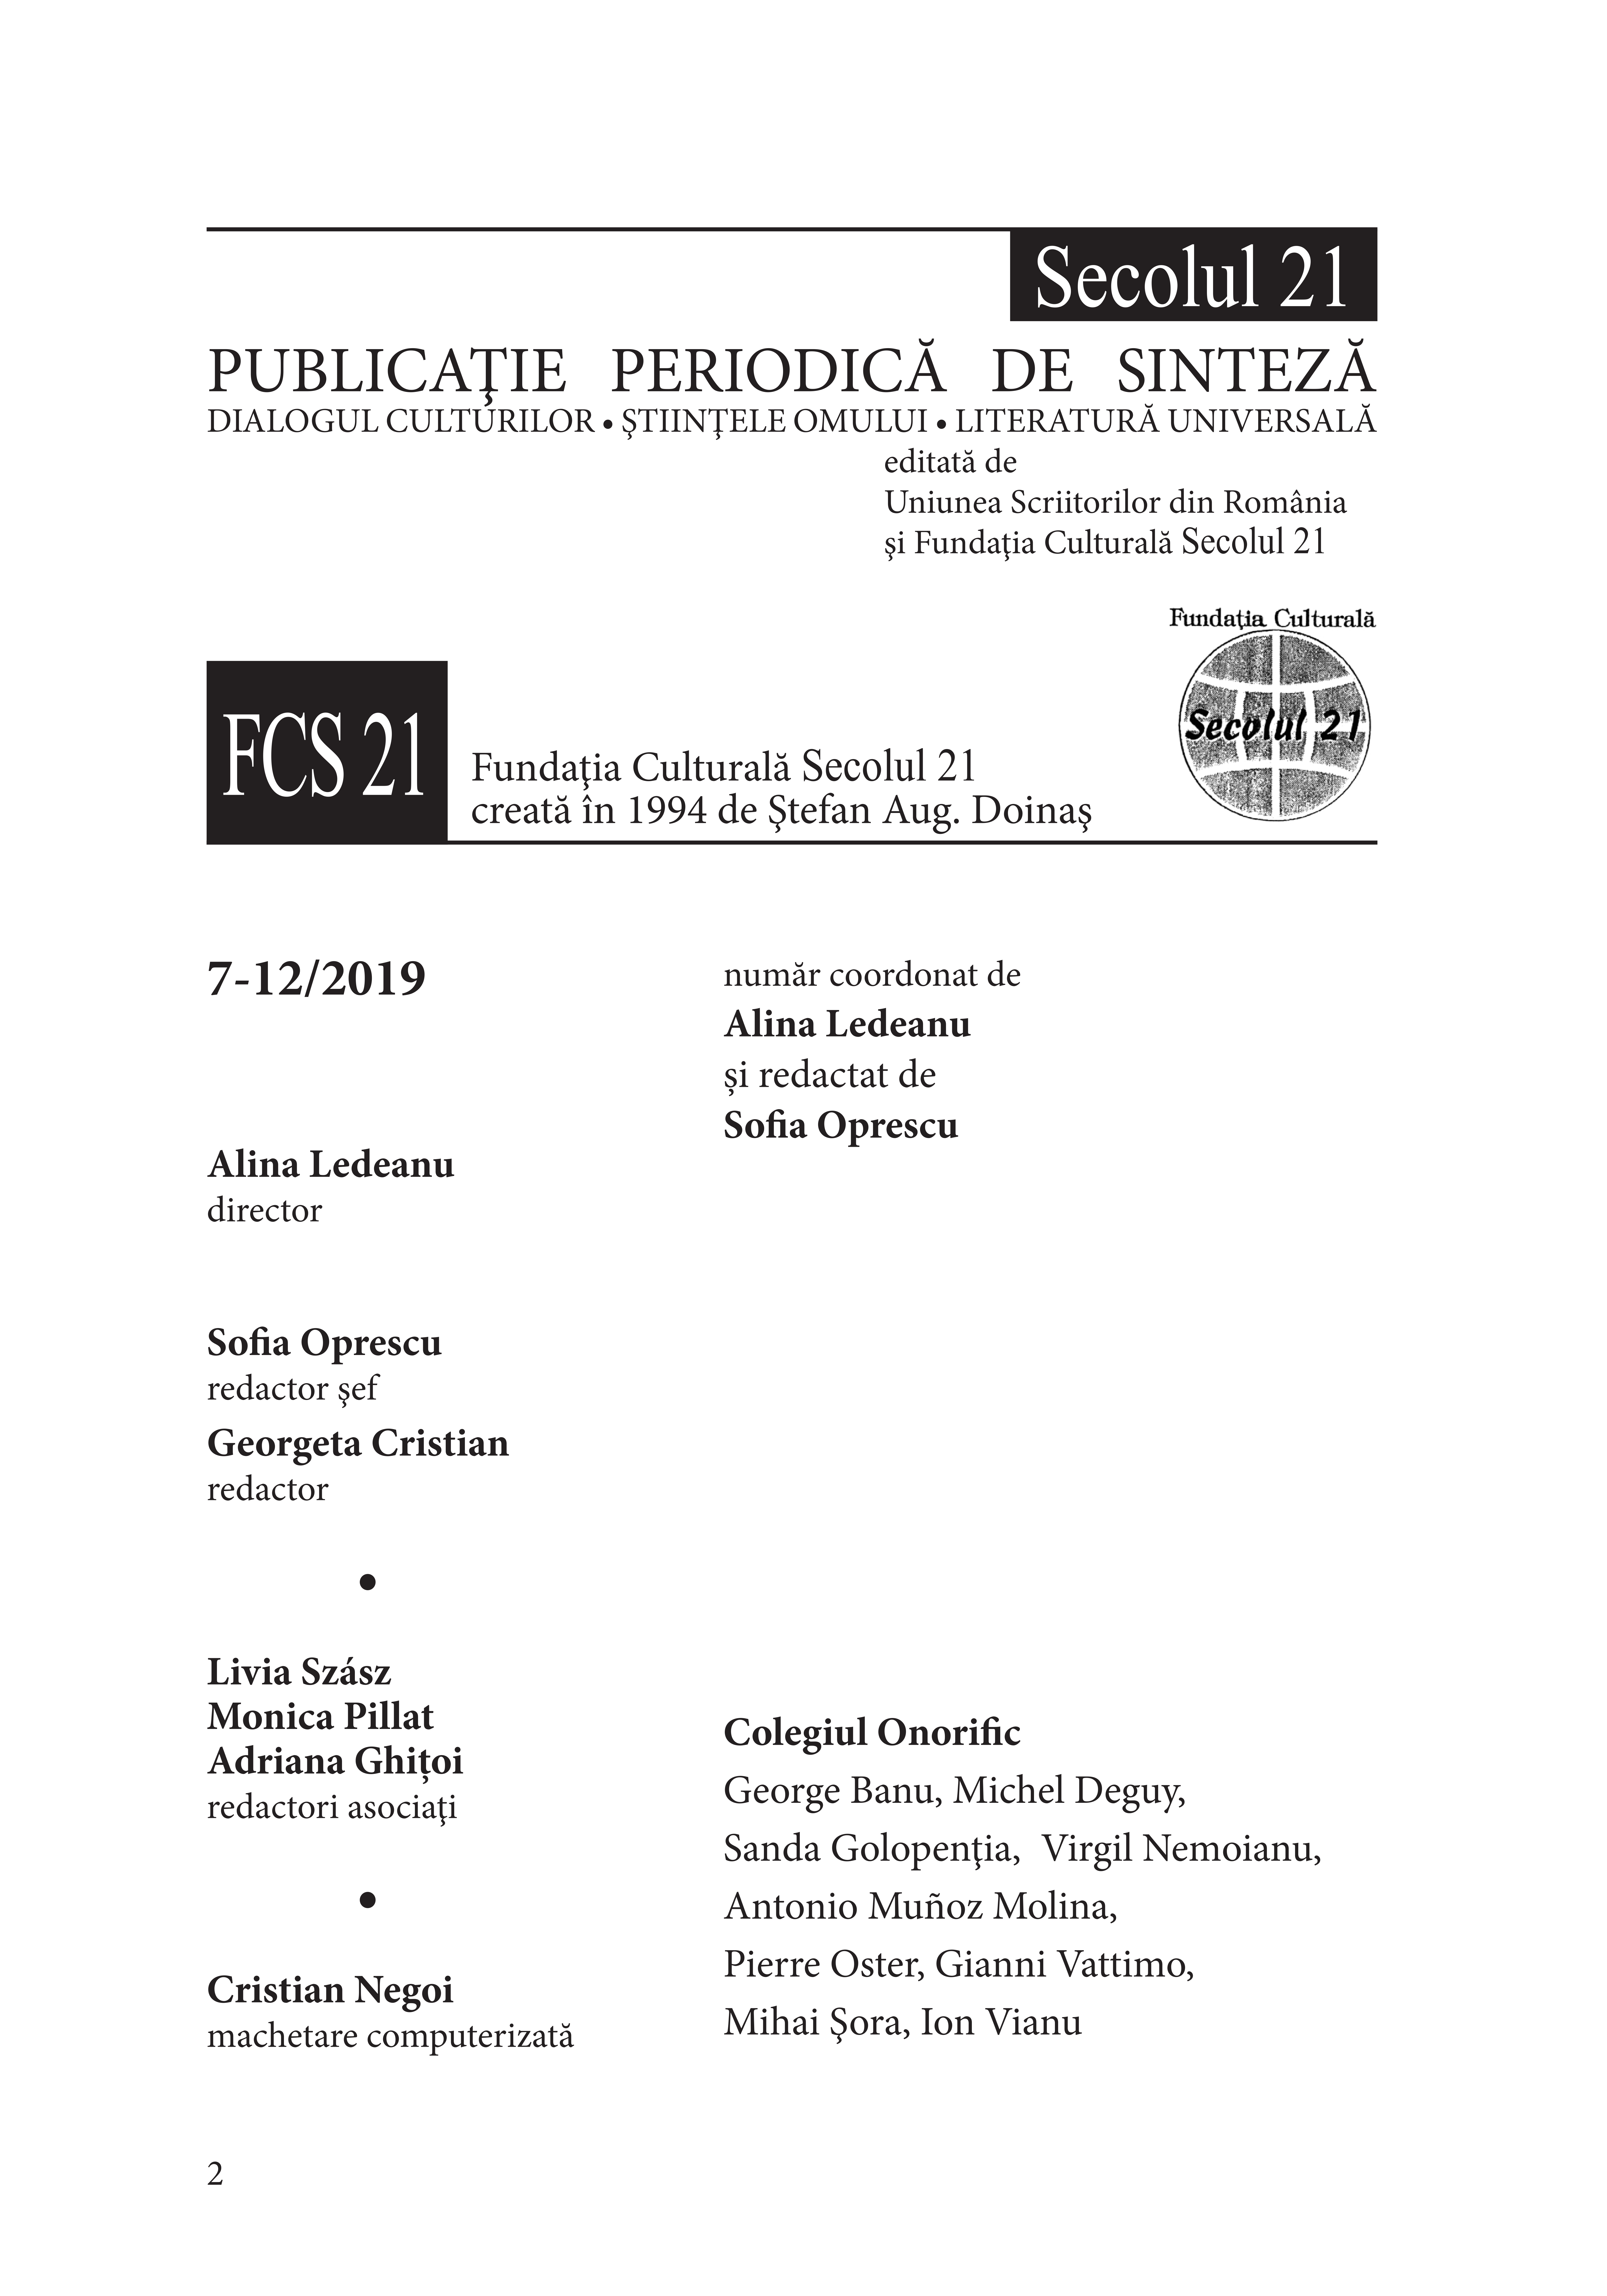 Secolul 21 - GEORGE BANU I 7-12/2019 caseta redactionala